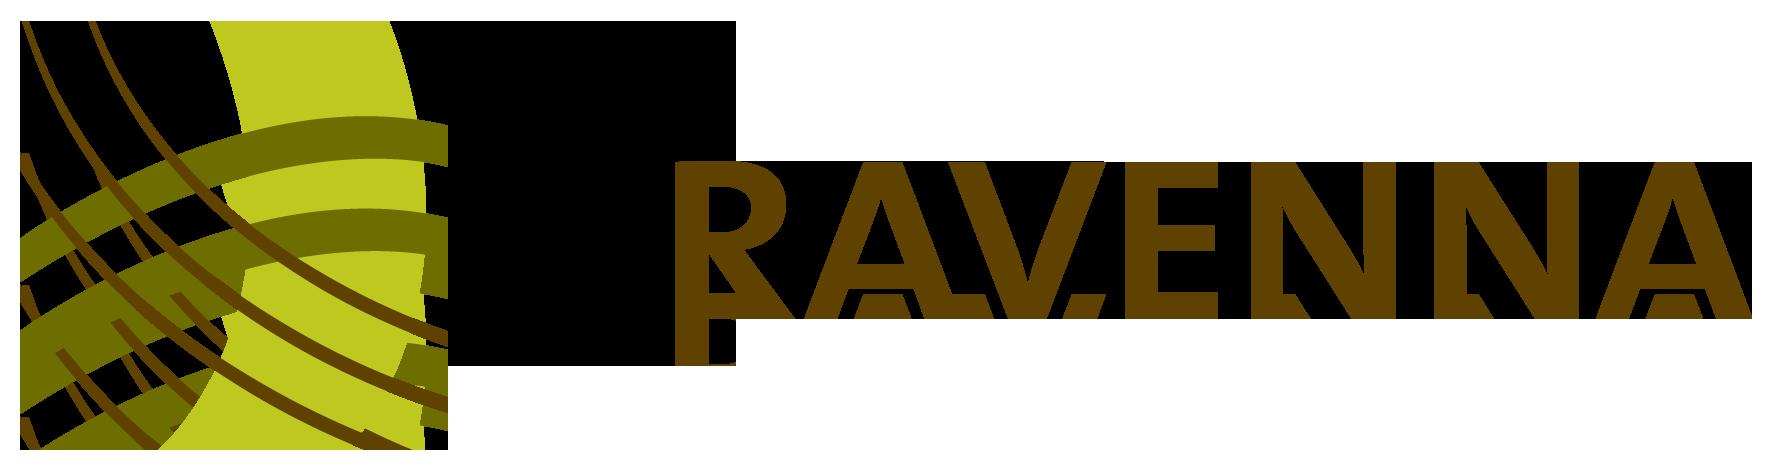 LOGO_Ravenna_QUER_RGB